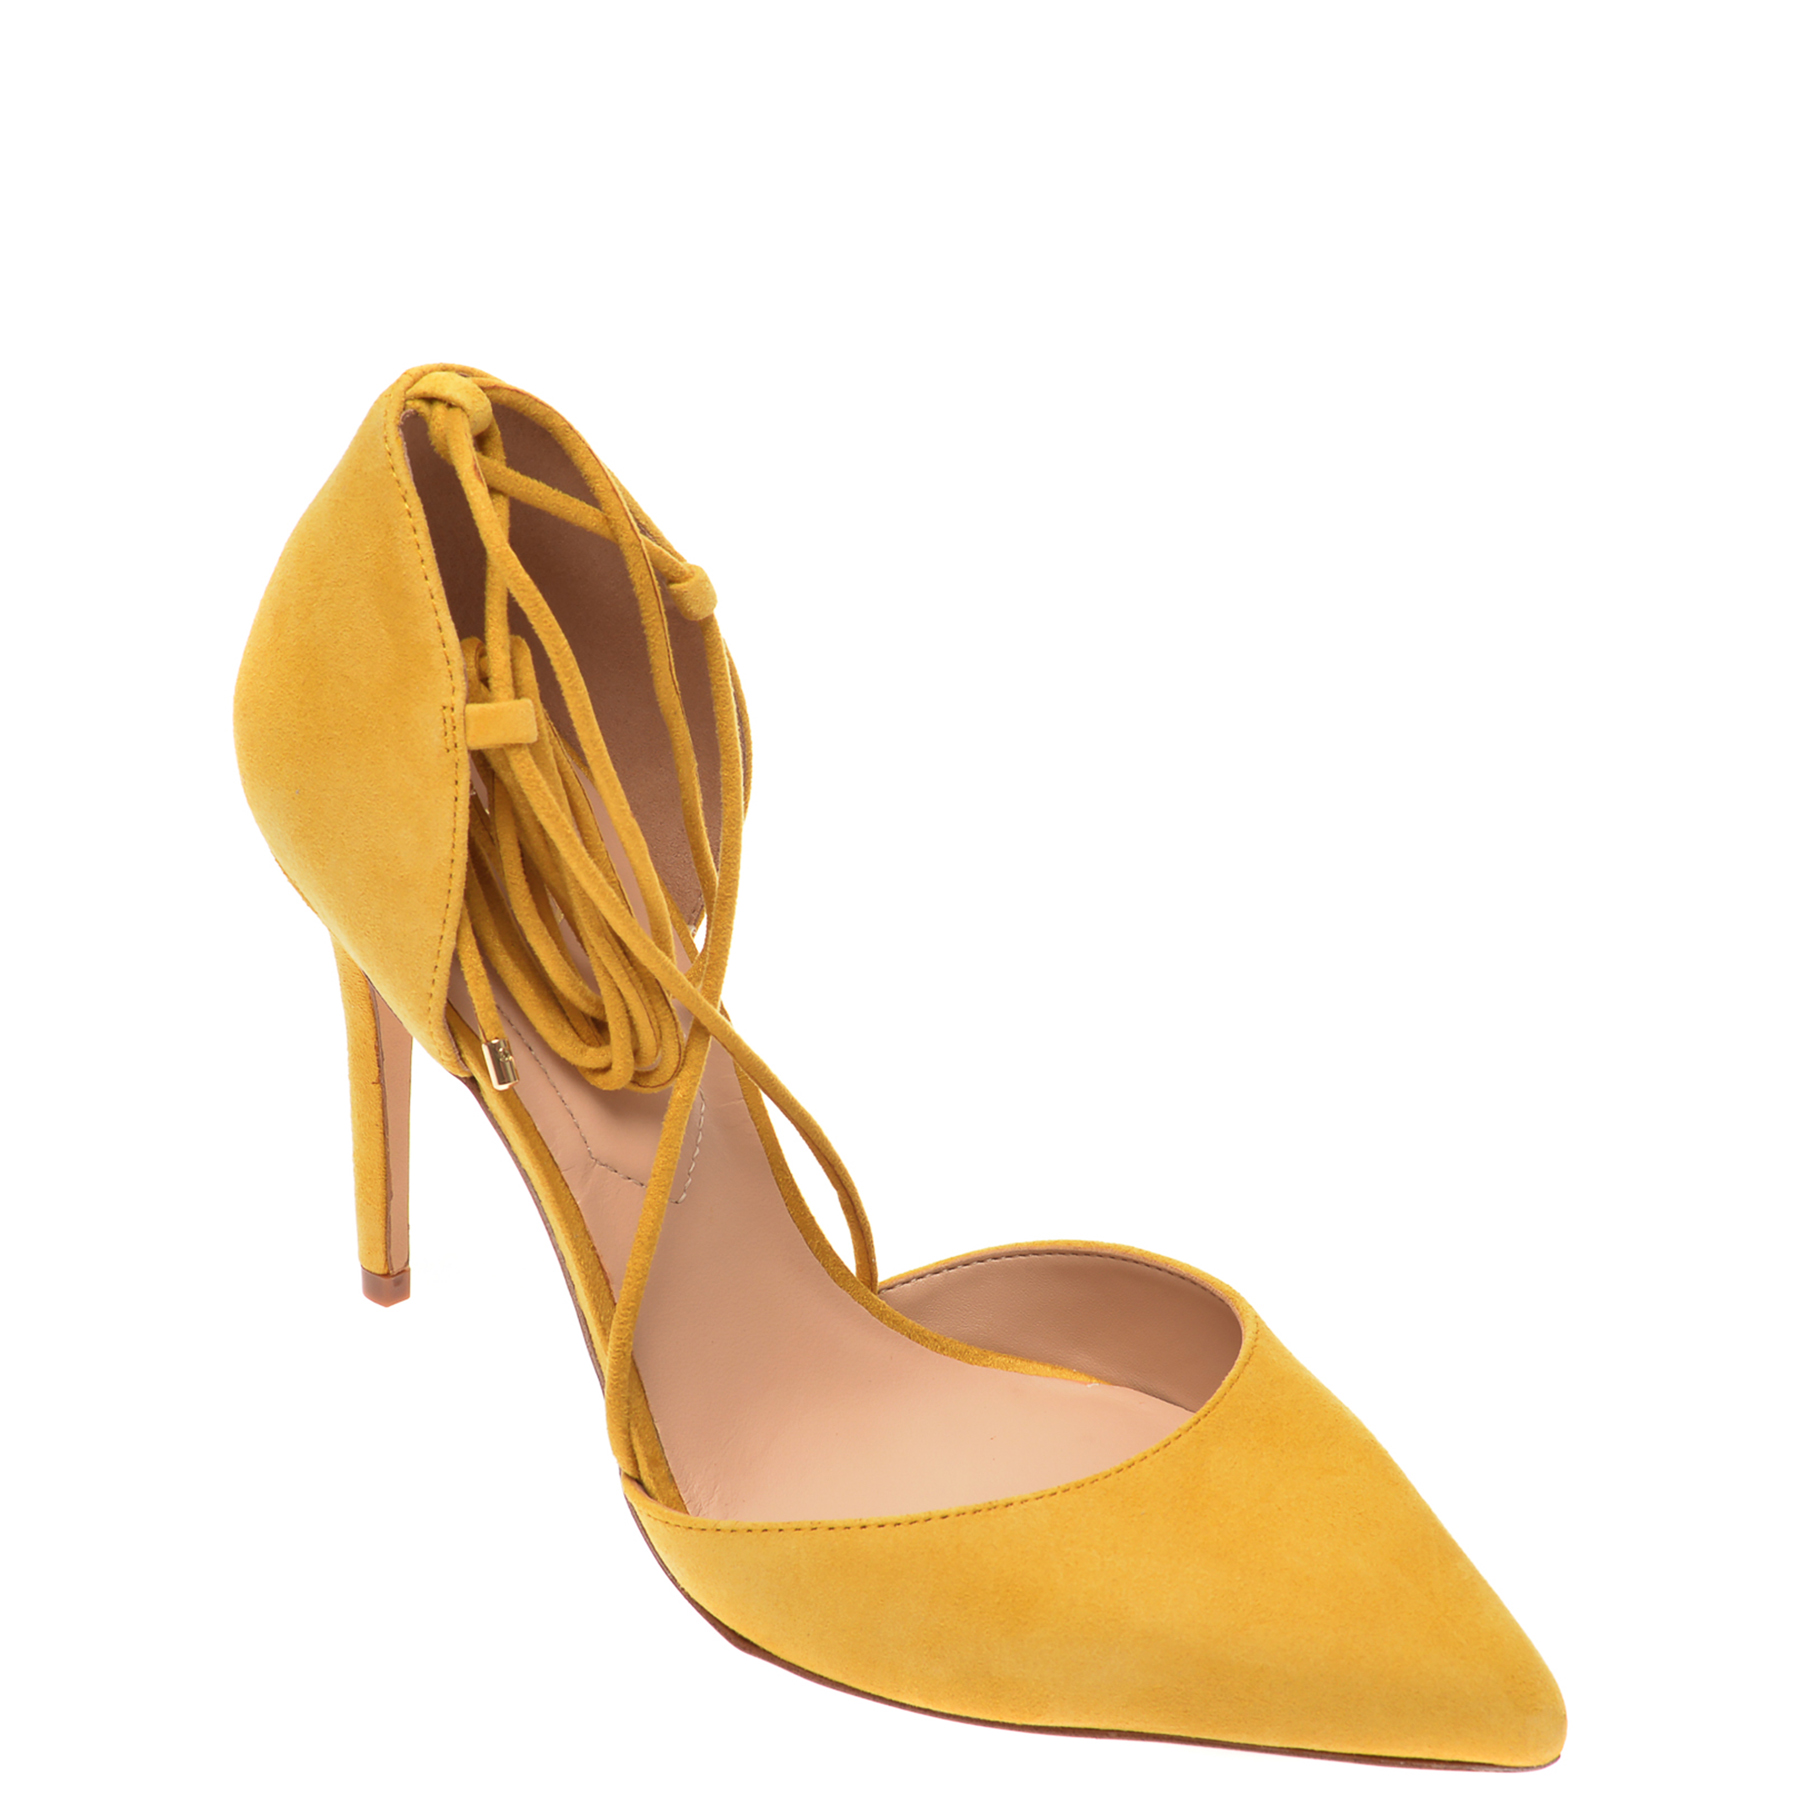 Pantofi ALDO galbeni, Finsbury730, din piele intoarsa imagine otter.ro